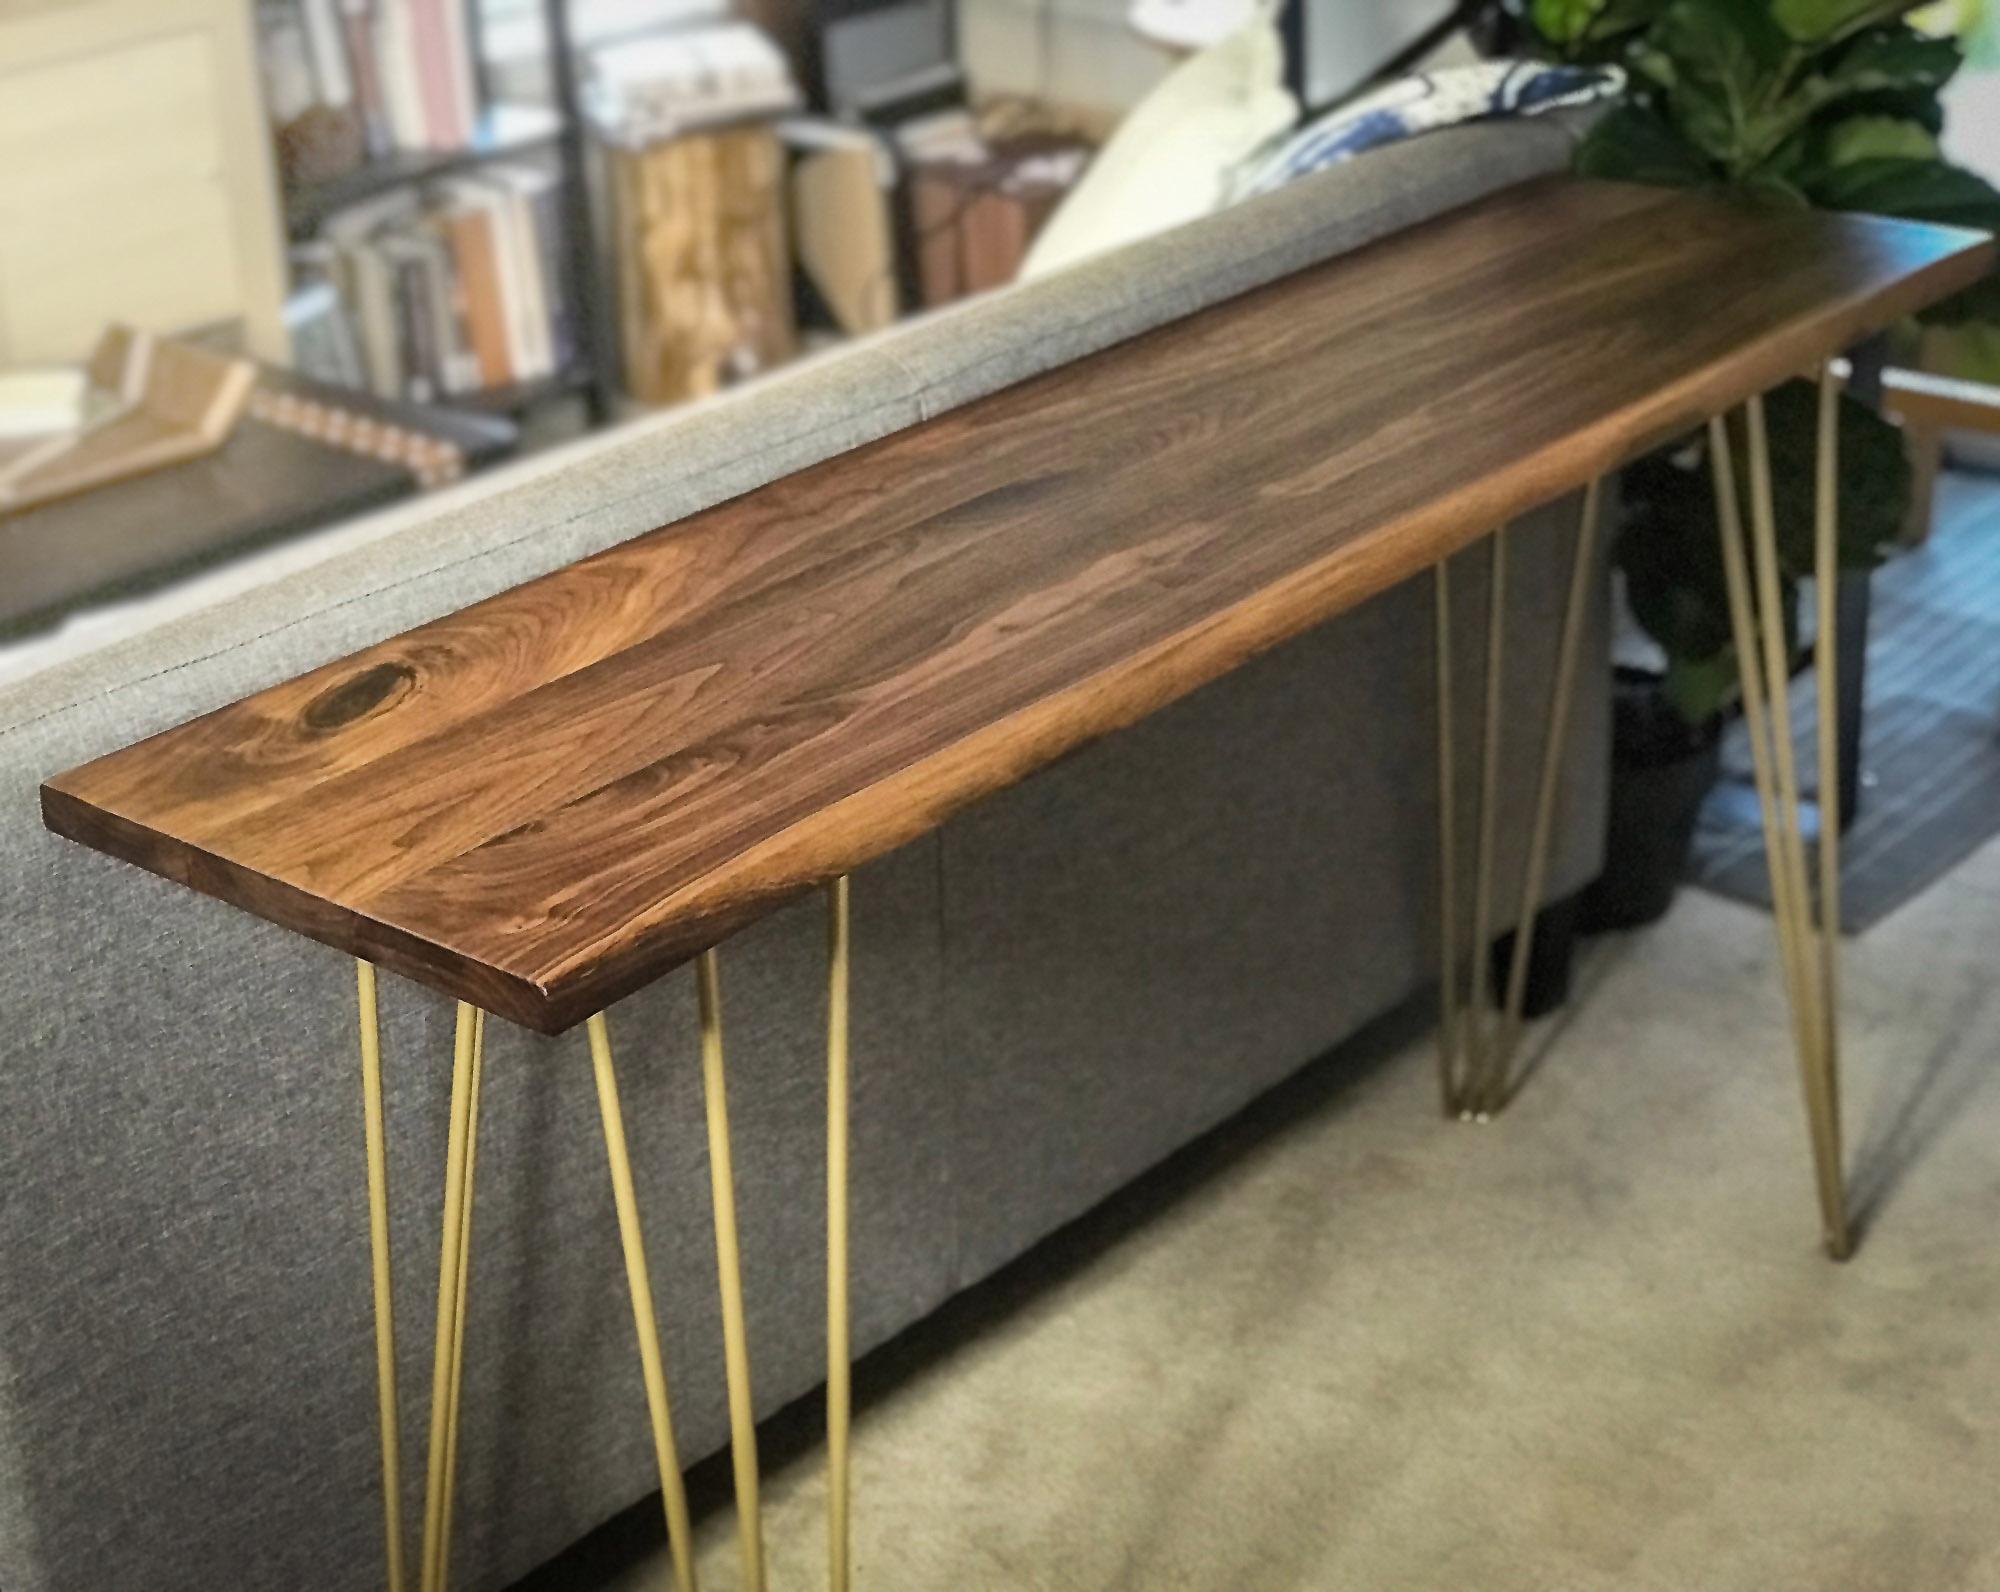 live edge walnut sofa table thisisurbanmade rh thisisurbanmade com live edge walnut sofa table live edge sofa table legs